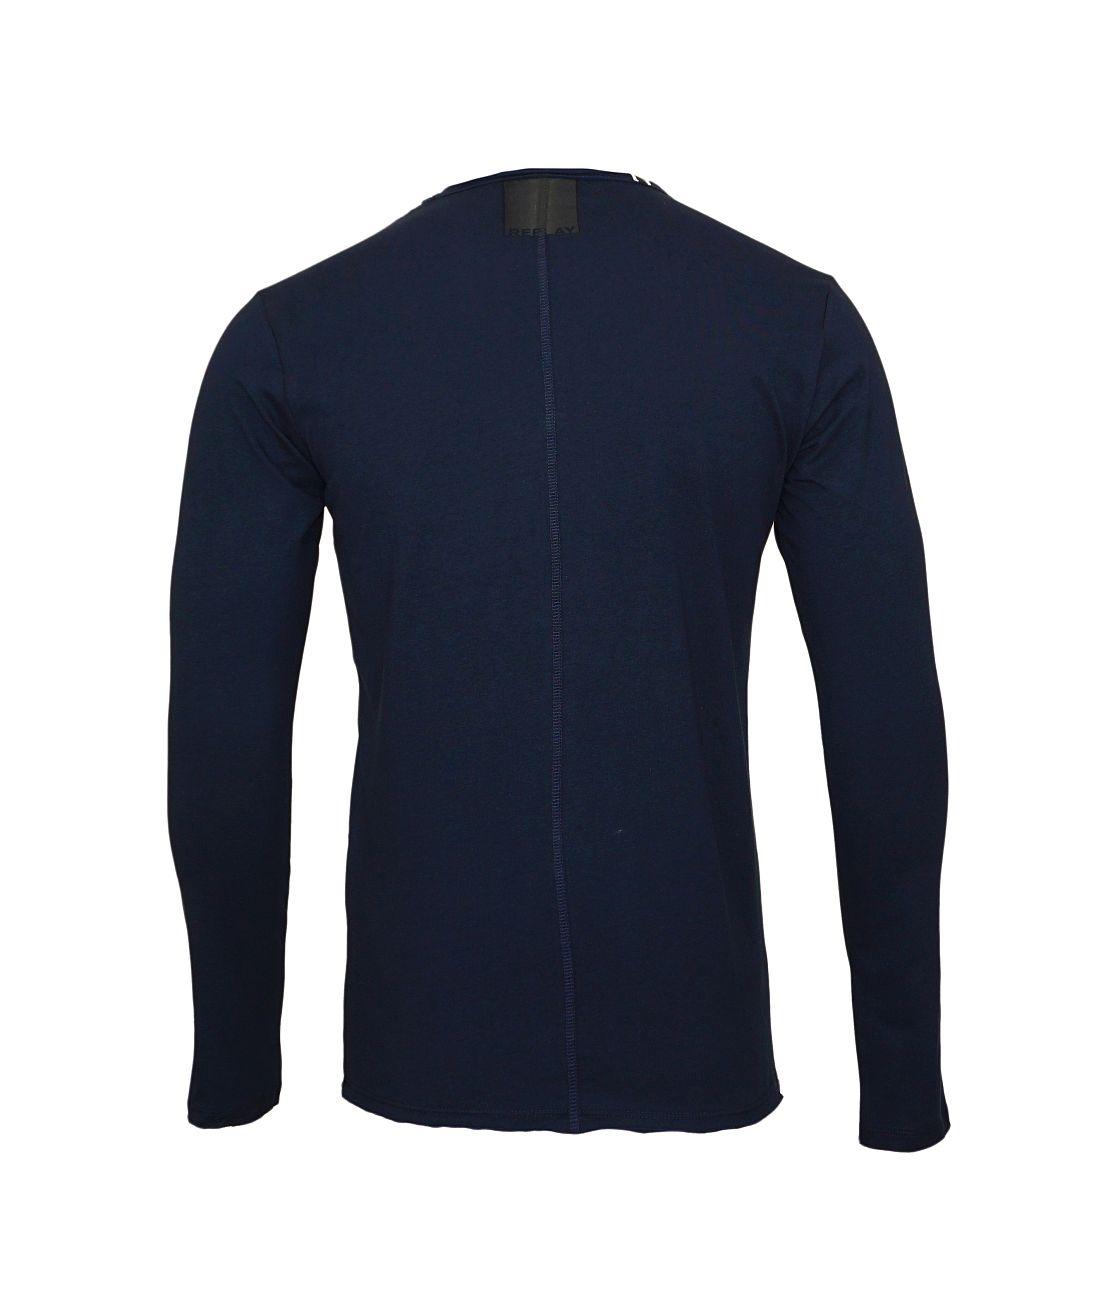 Replay Longsleeve Shirt Rundhals M3592.000 2660.576 MIDNIGHT BLUE S18-RPLS1